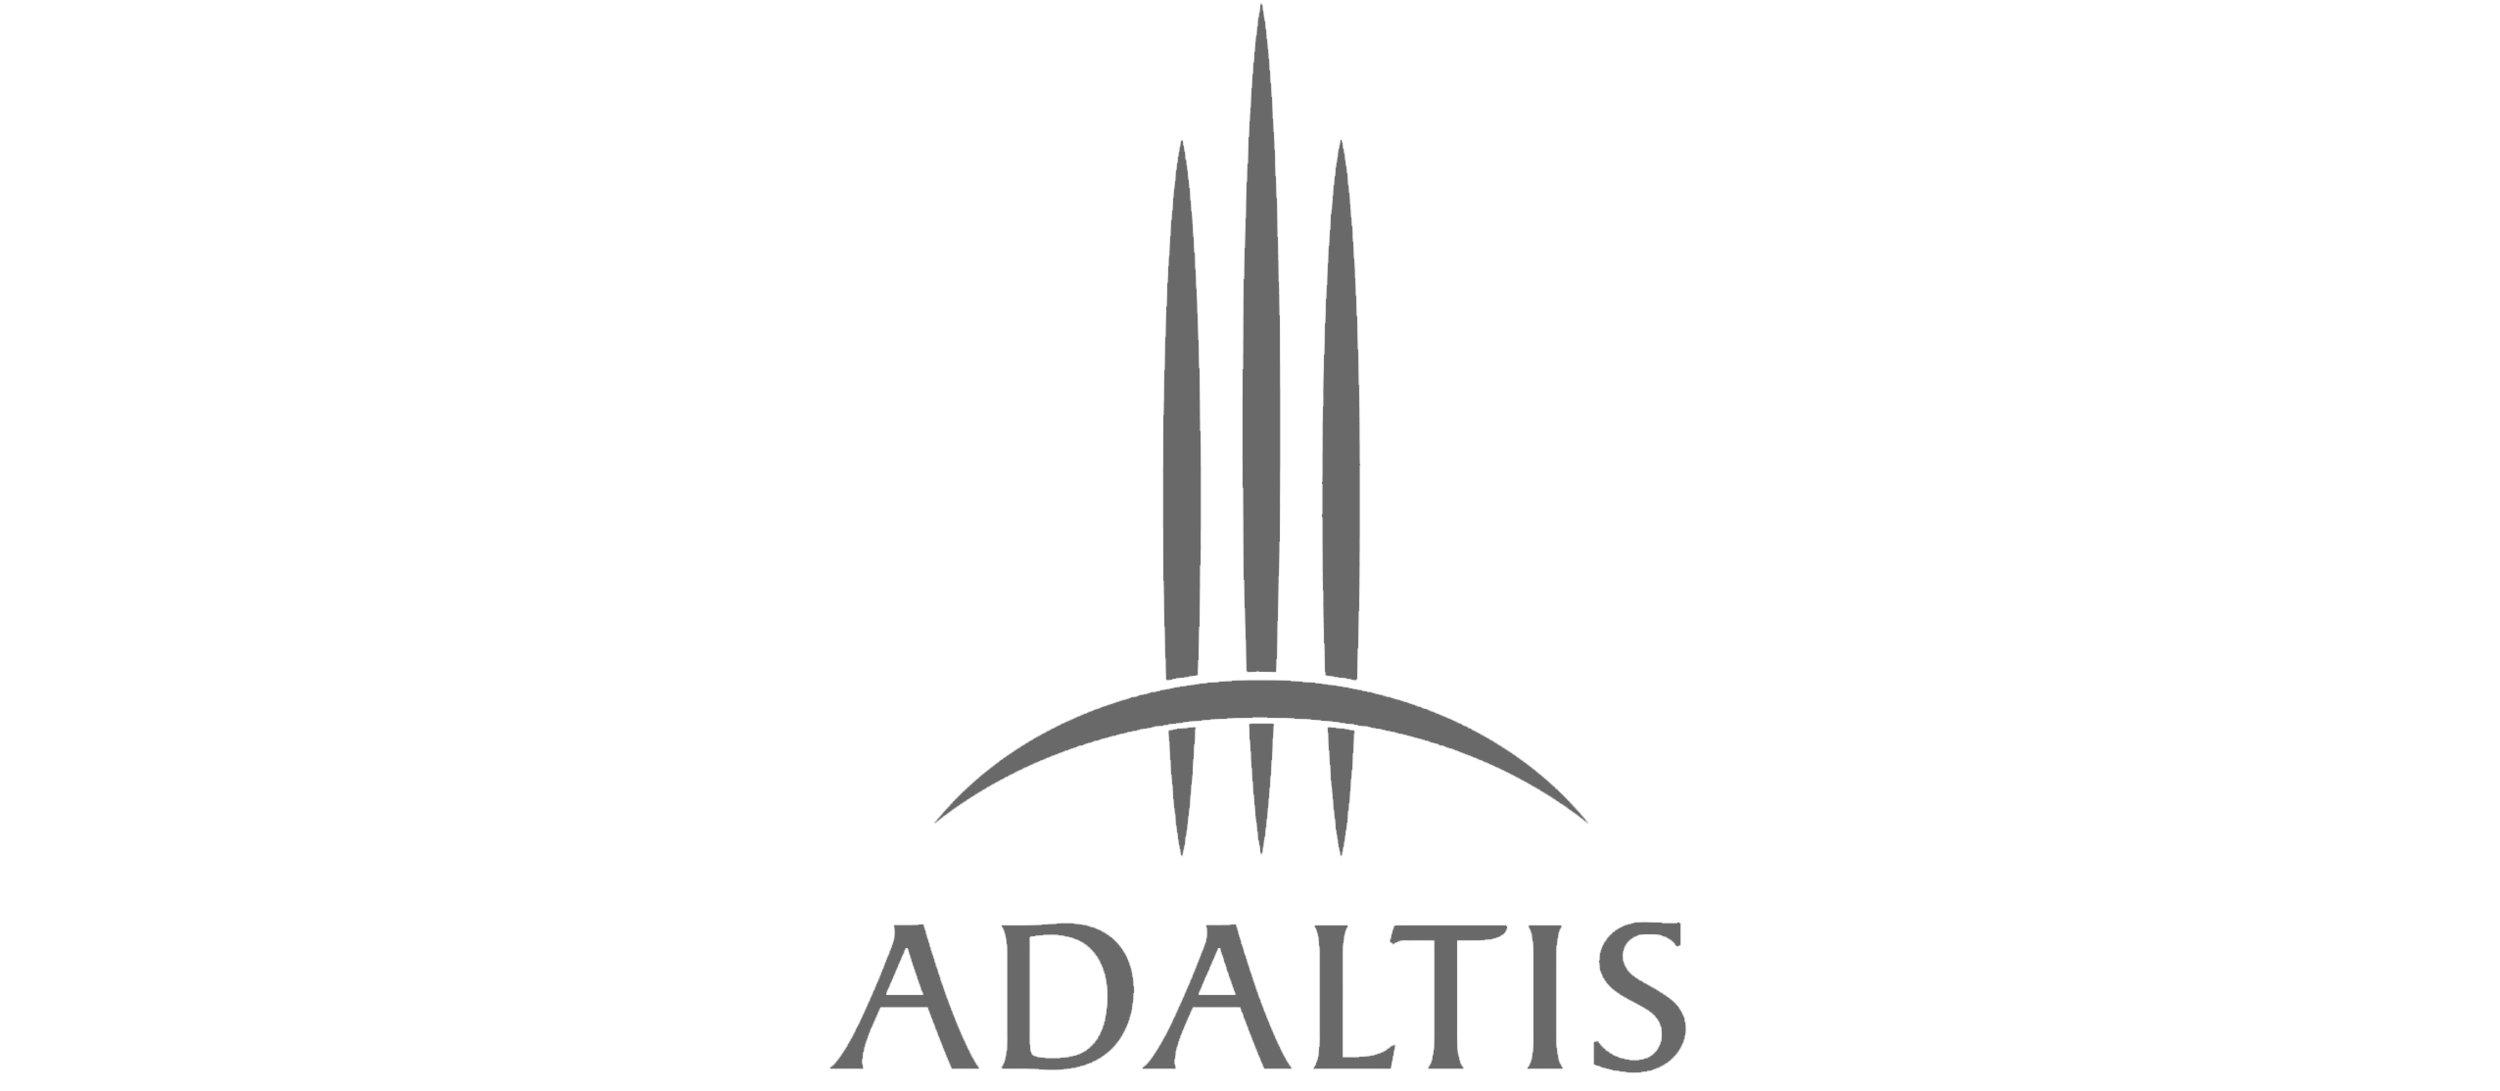 Adaltis.jpg